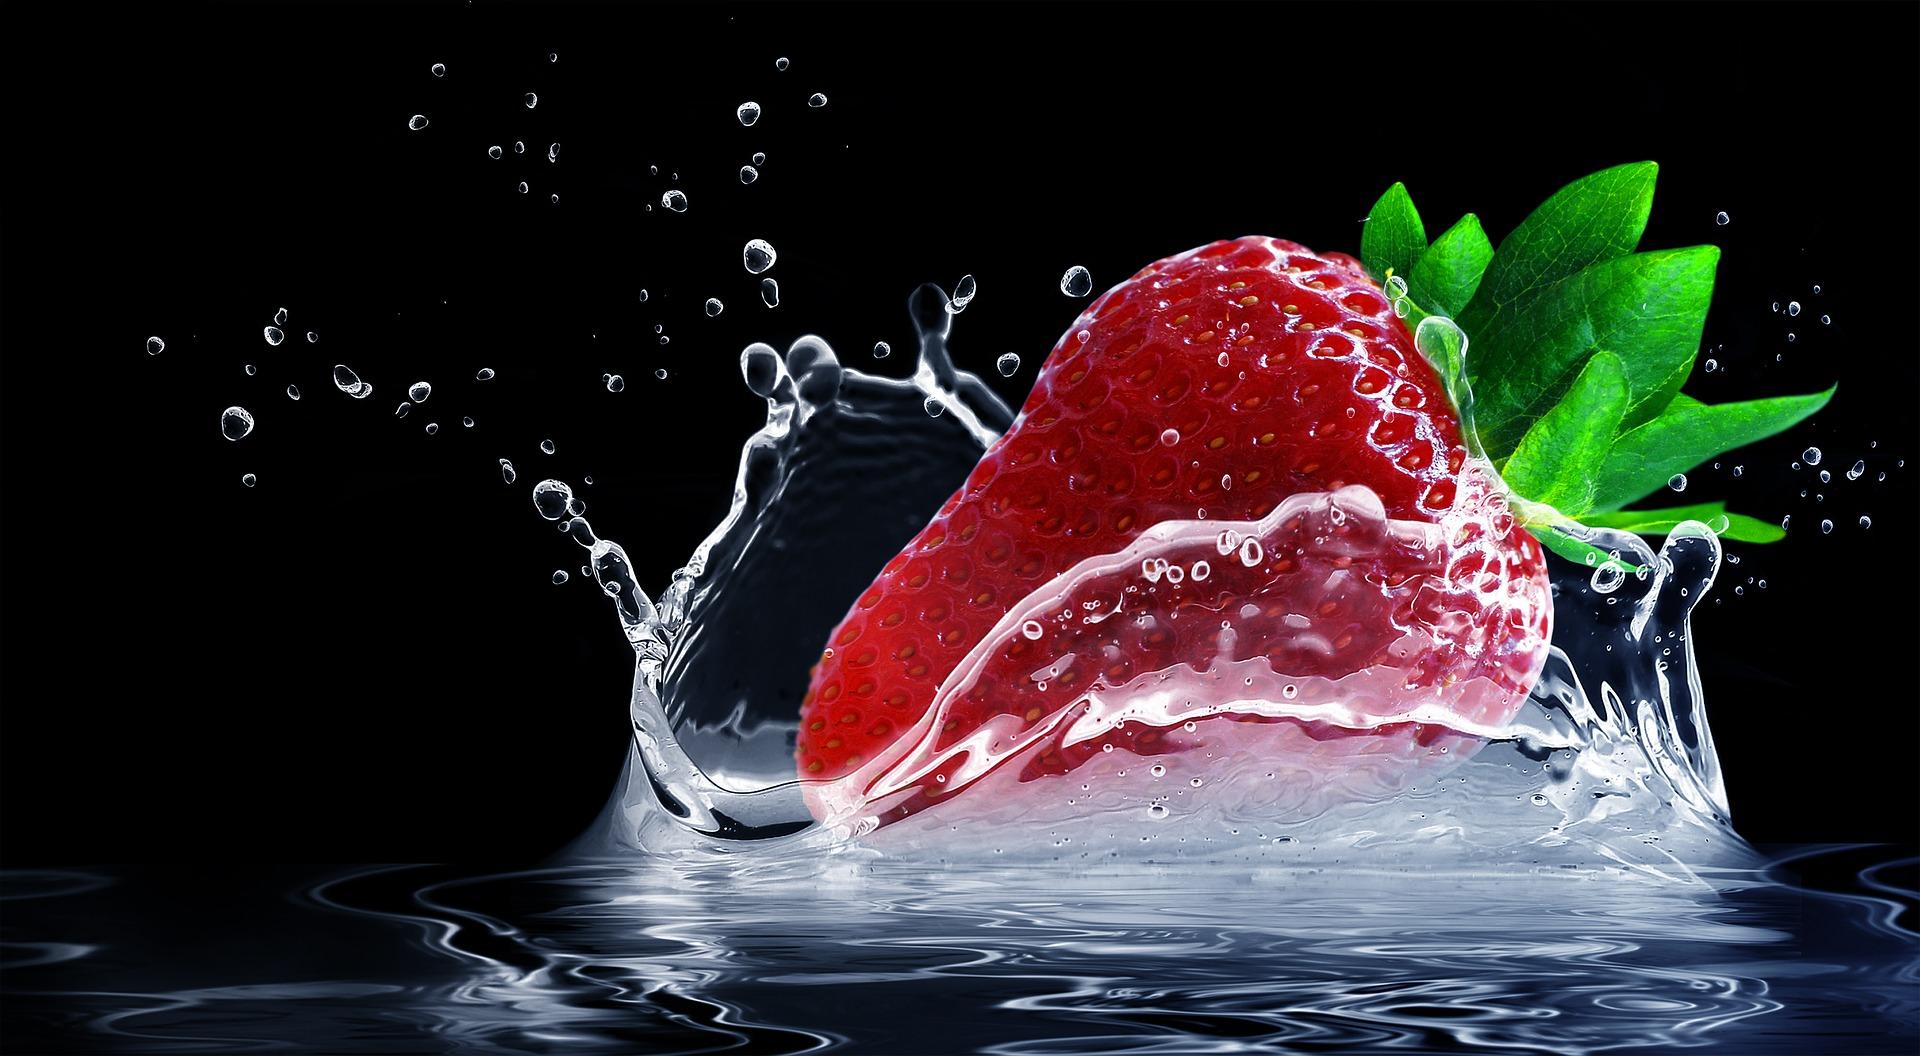 https://sesolofosselei.files.wordpress.com/2017/05/strawberry-2293337_1920.jpg